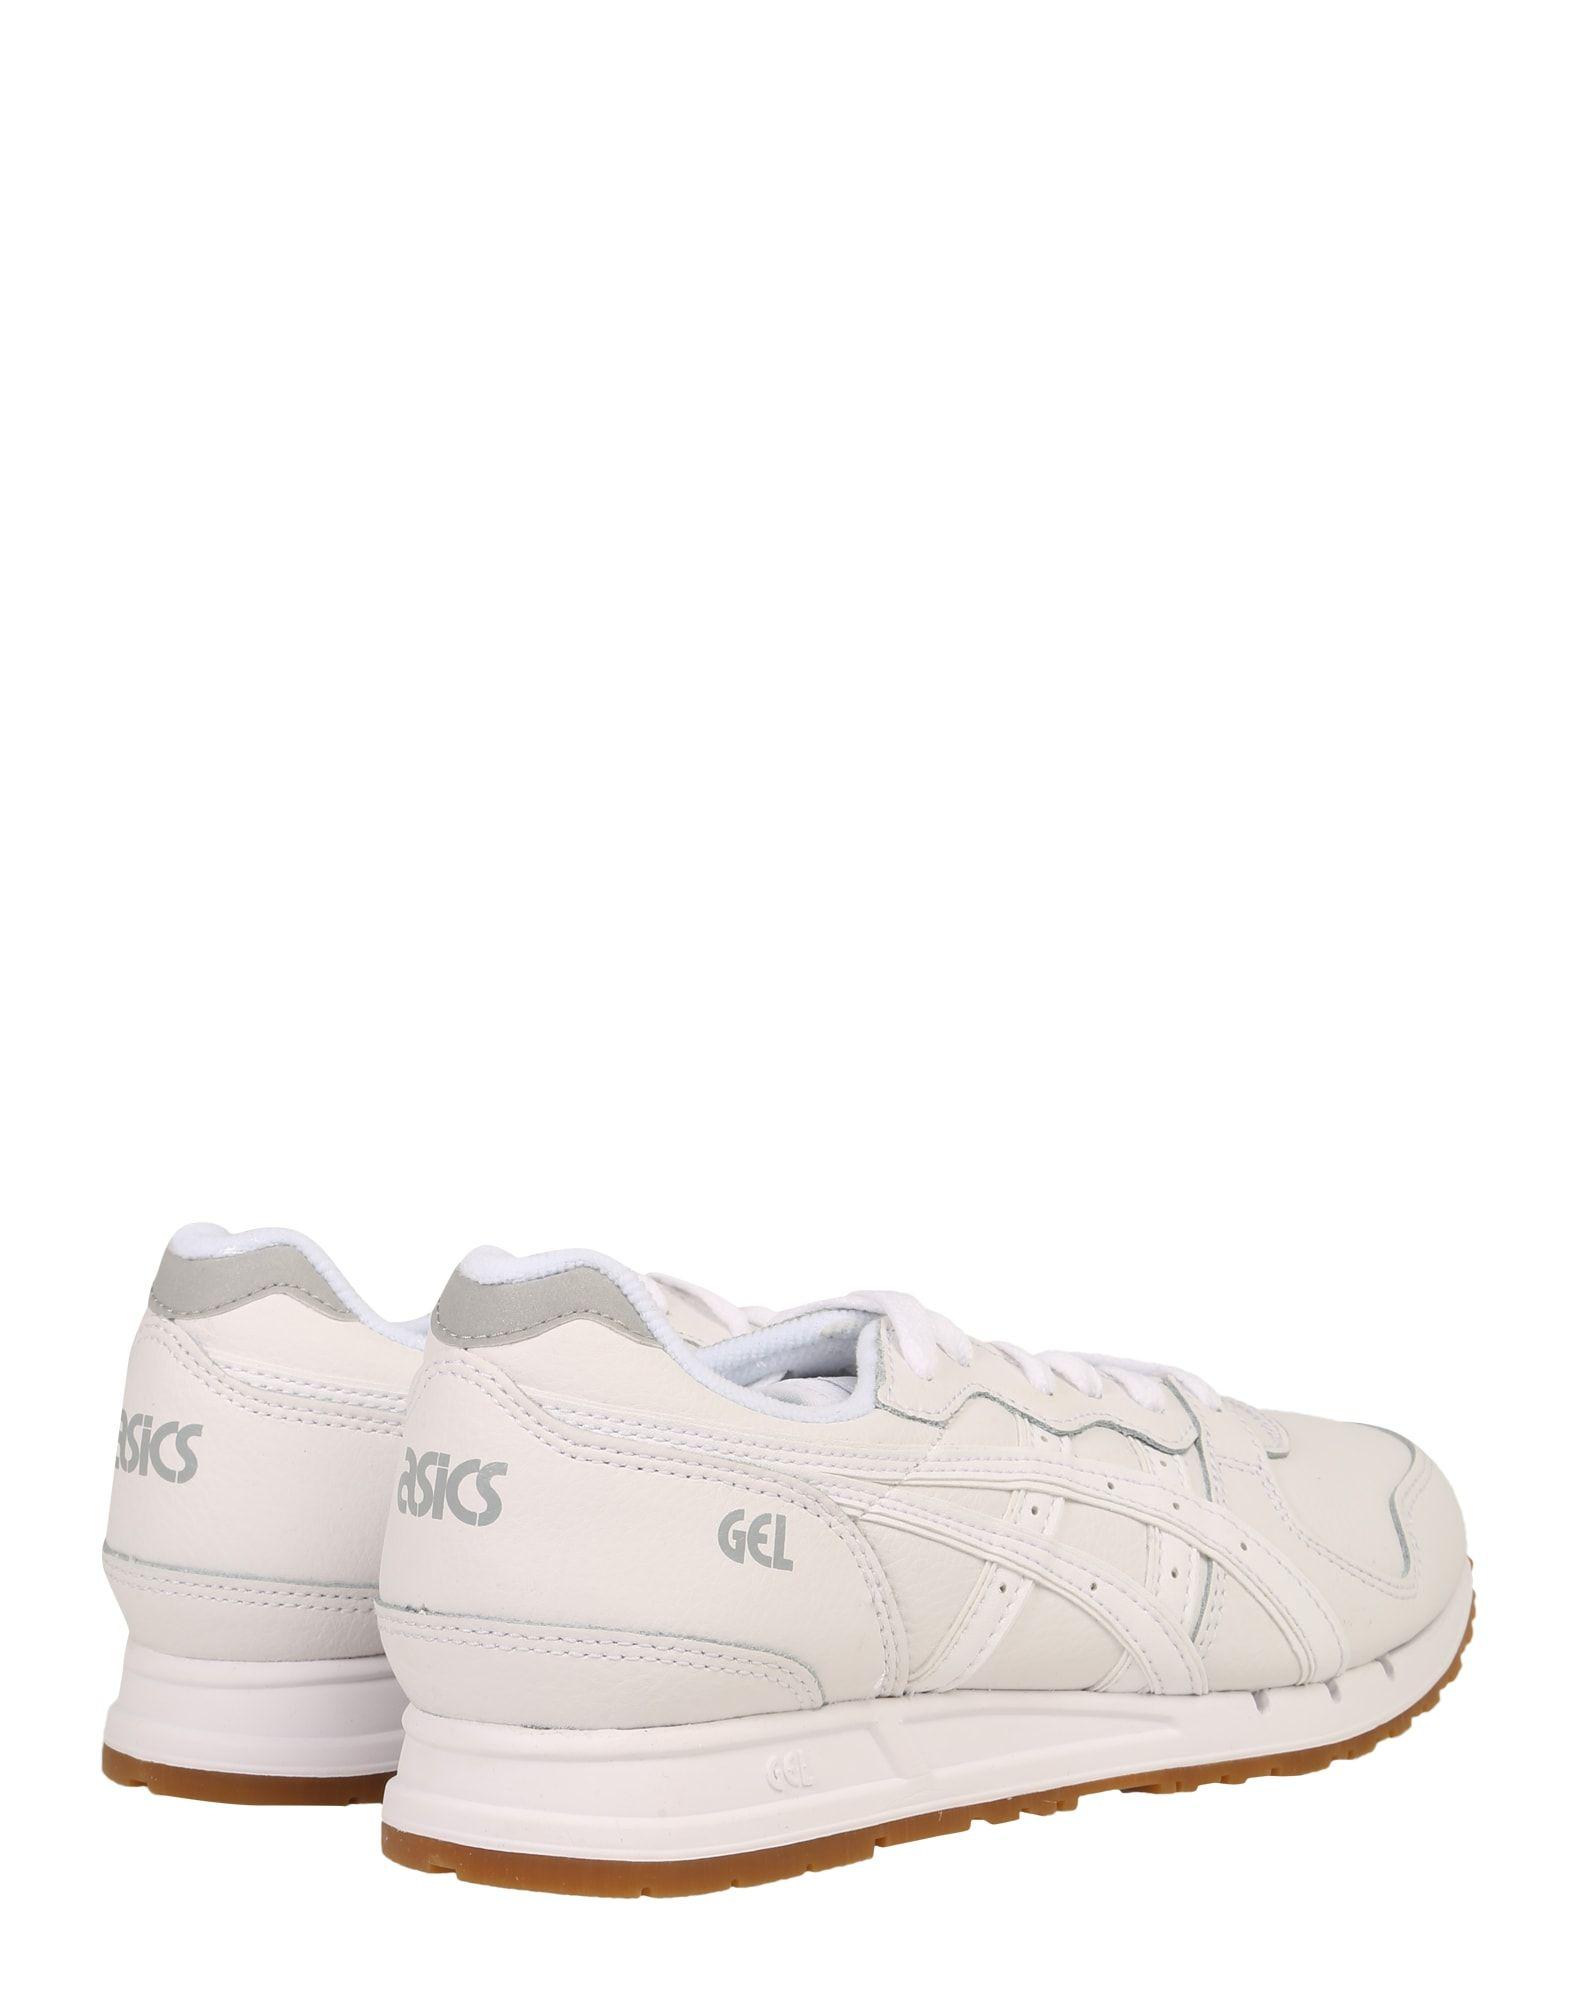 ASICS SportStyle Sneaker 'MOVIMENTUM' Damen, Weiß, Größe 42 ...